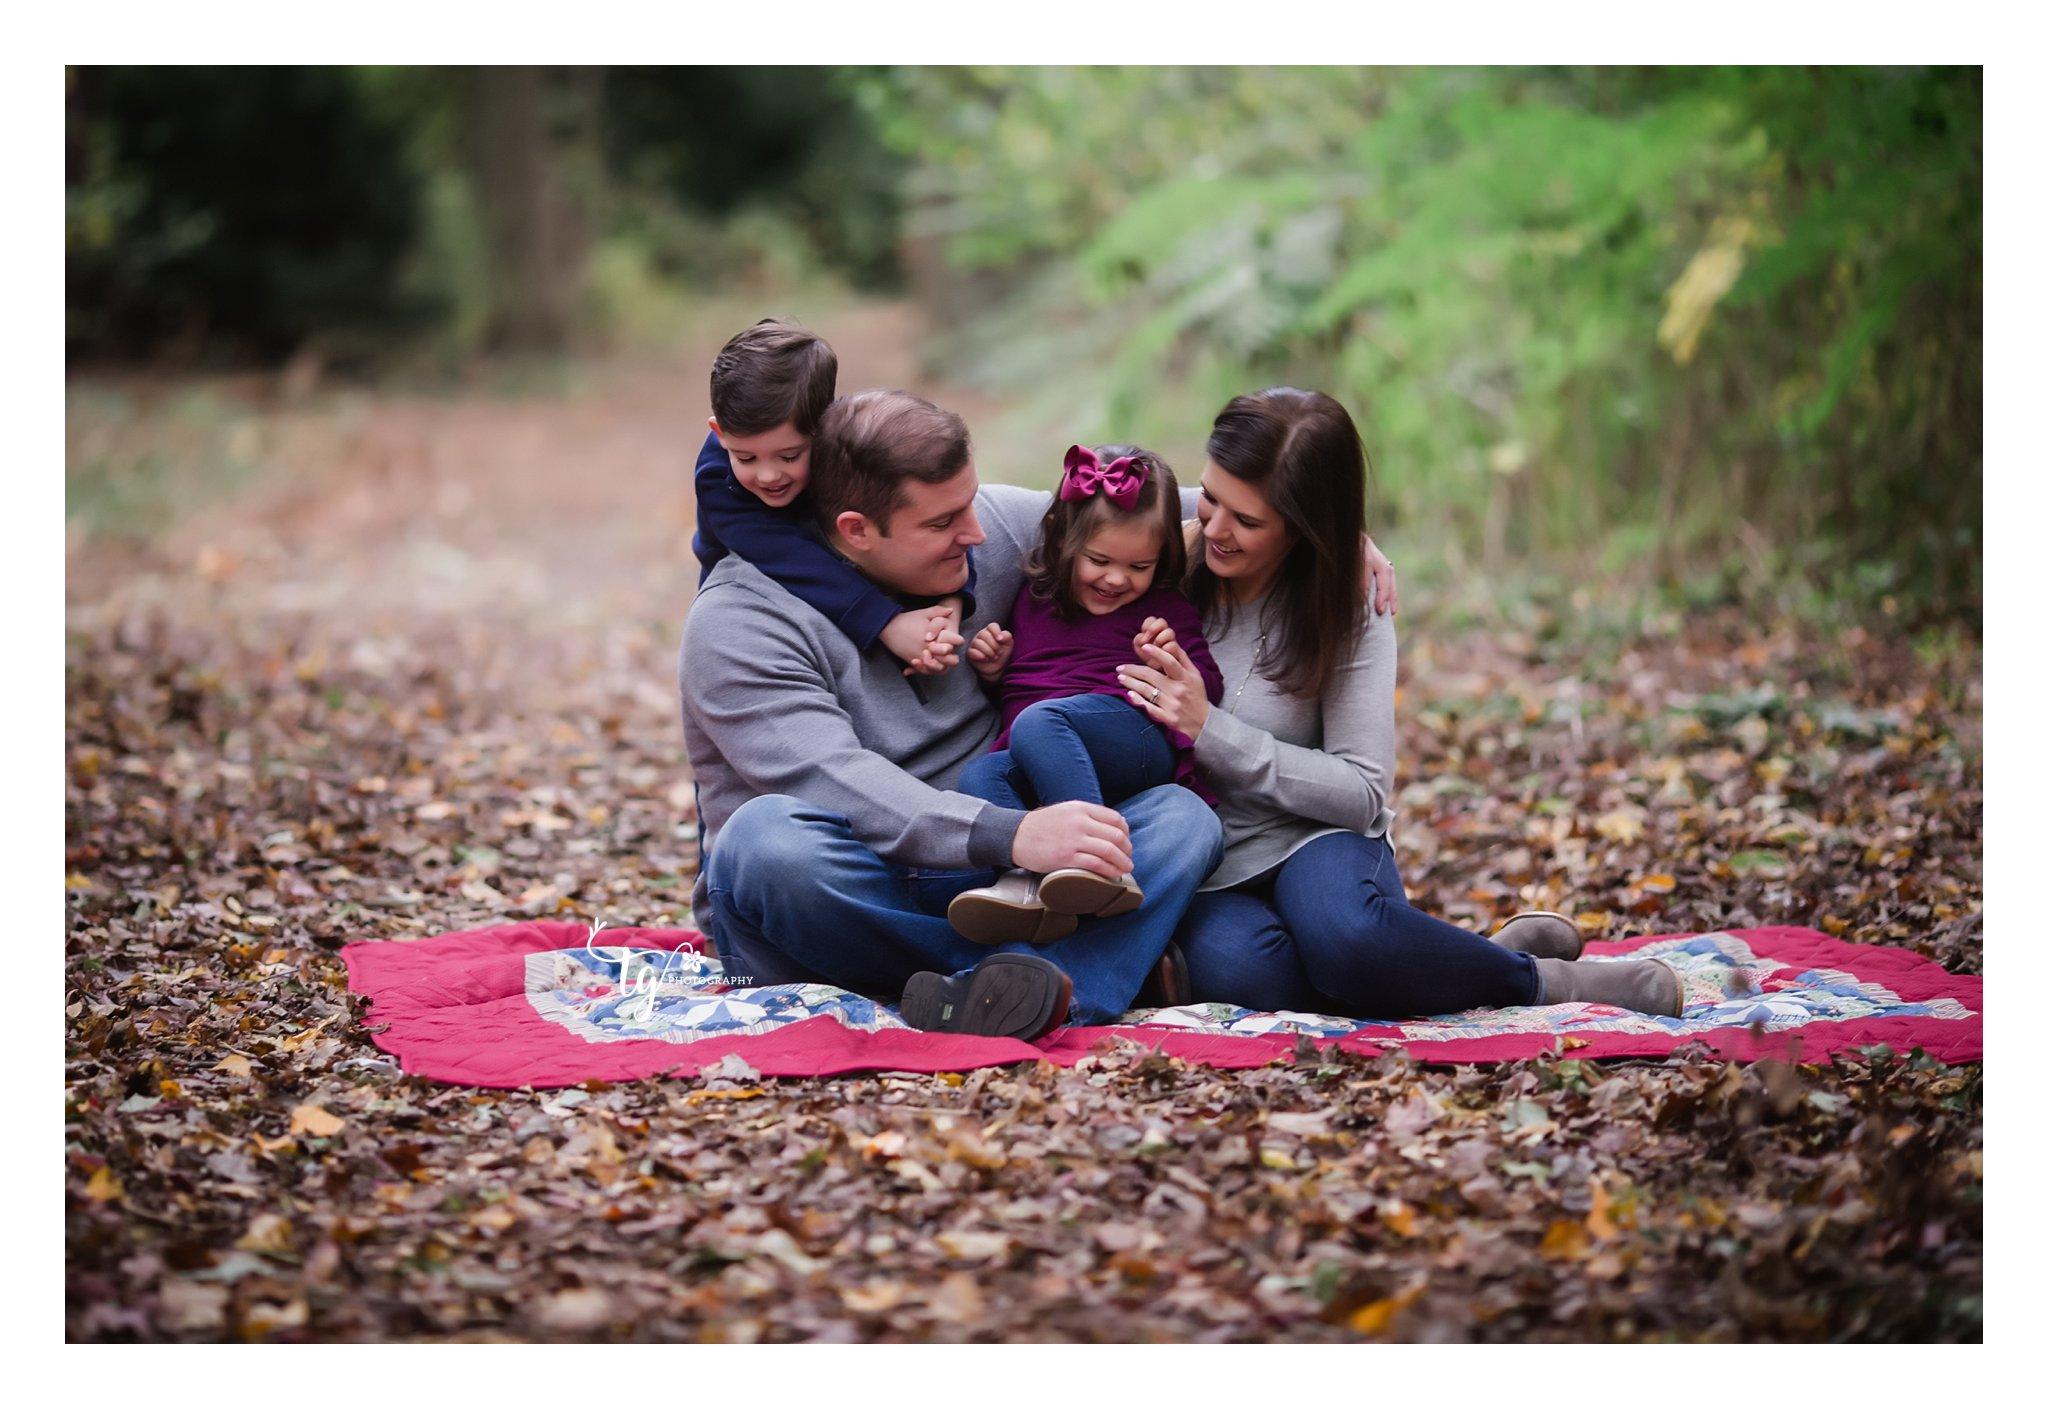 Emotive family portraits